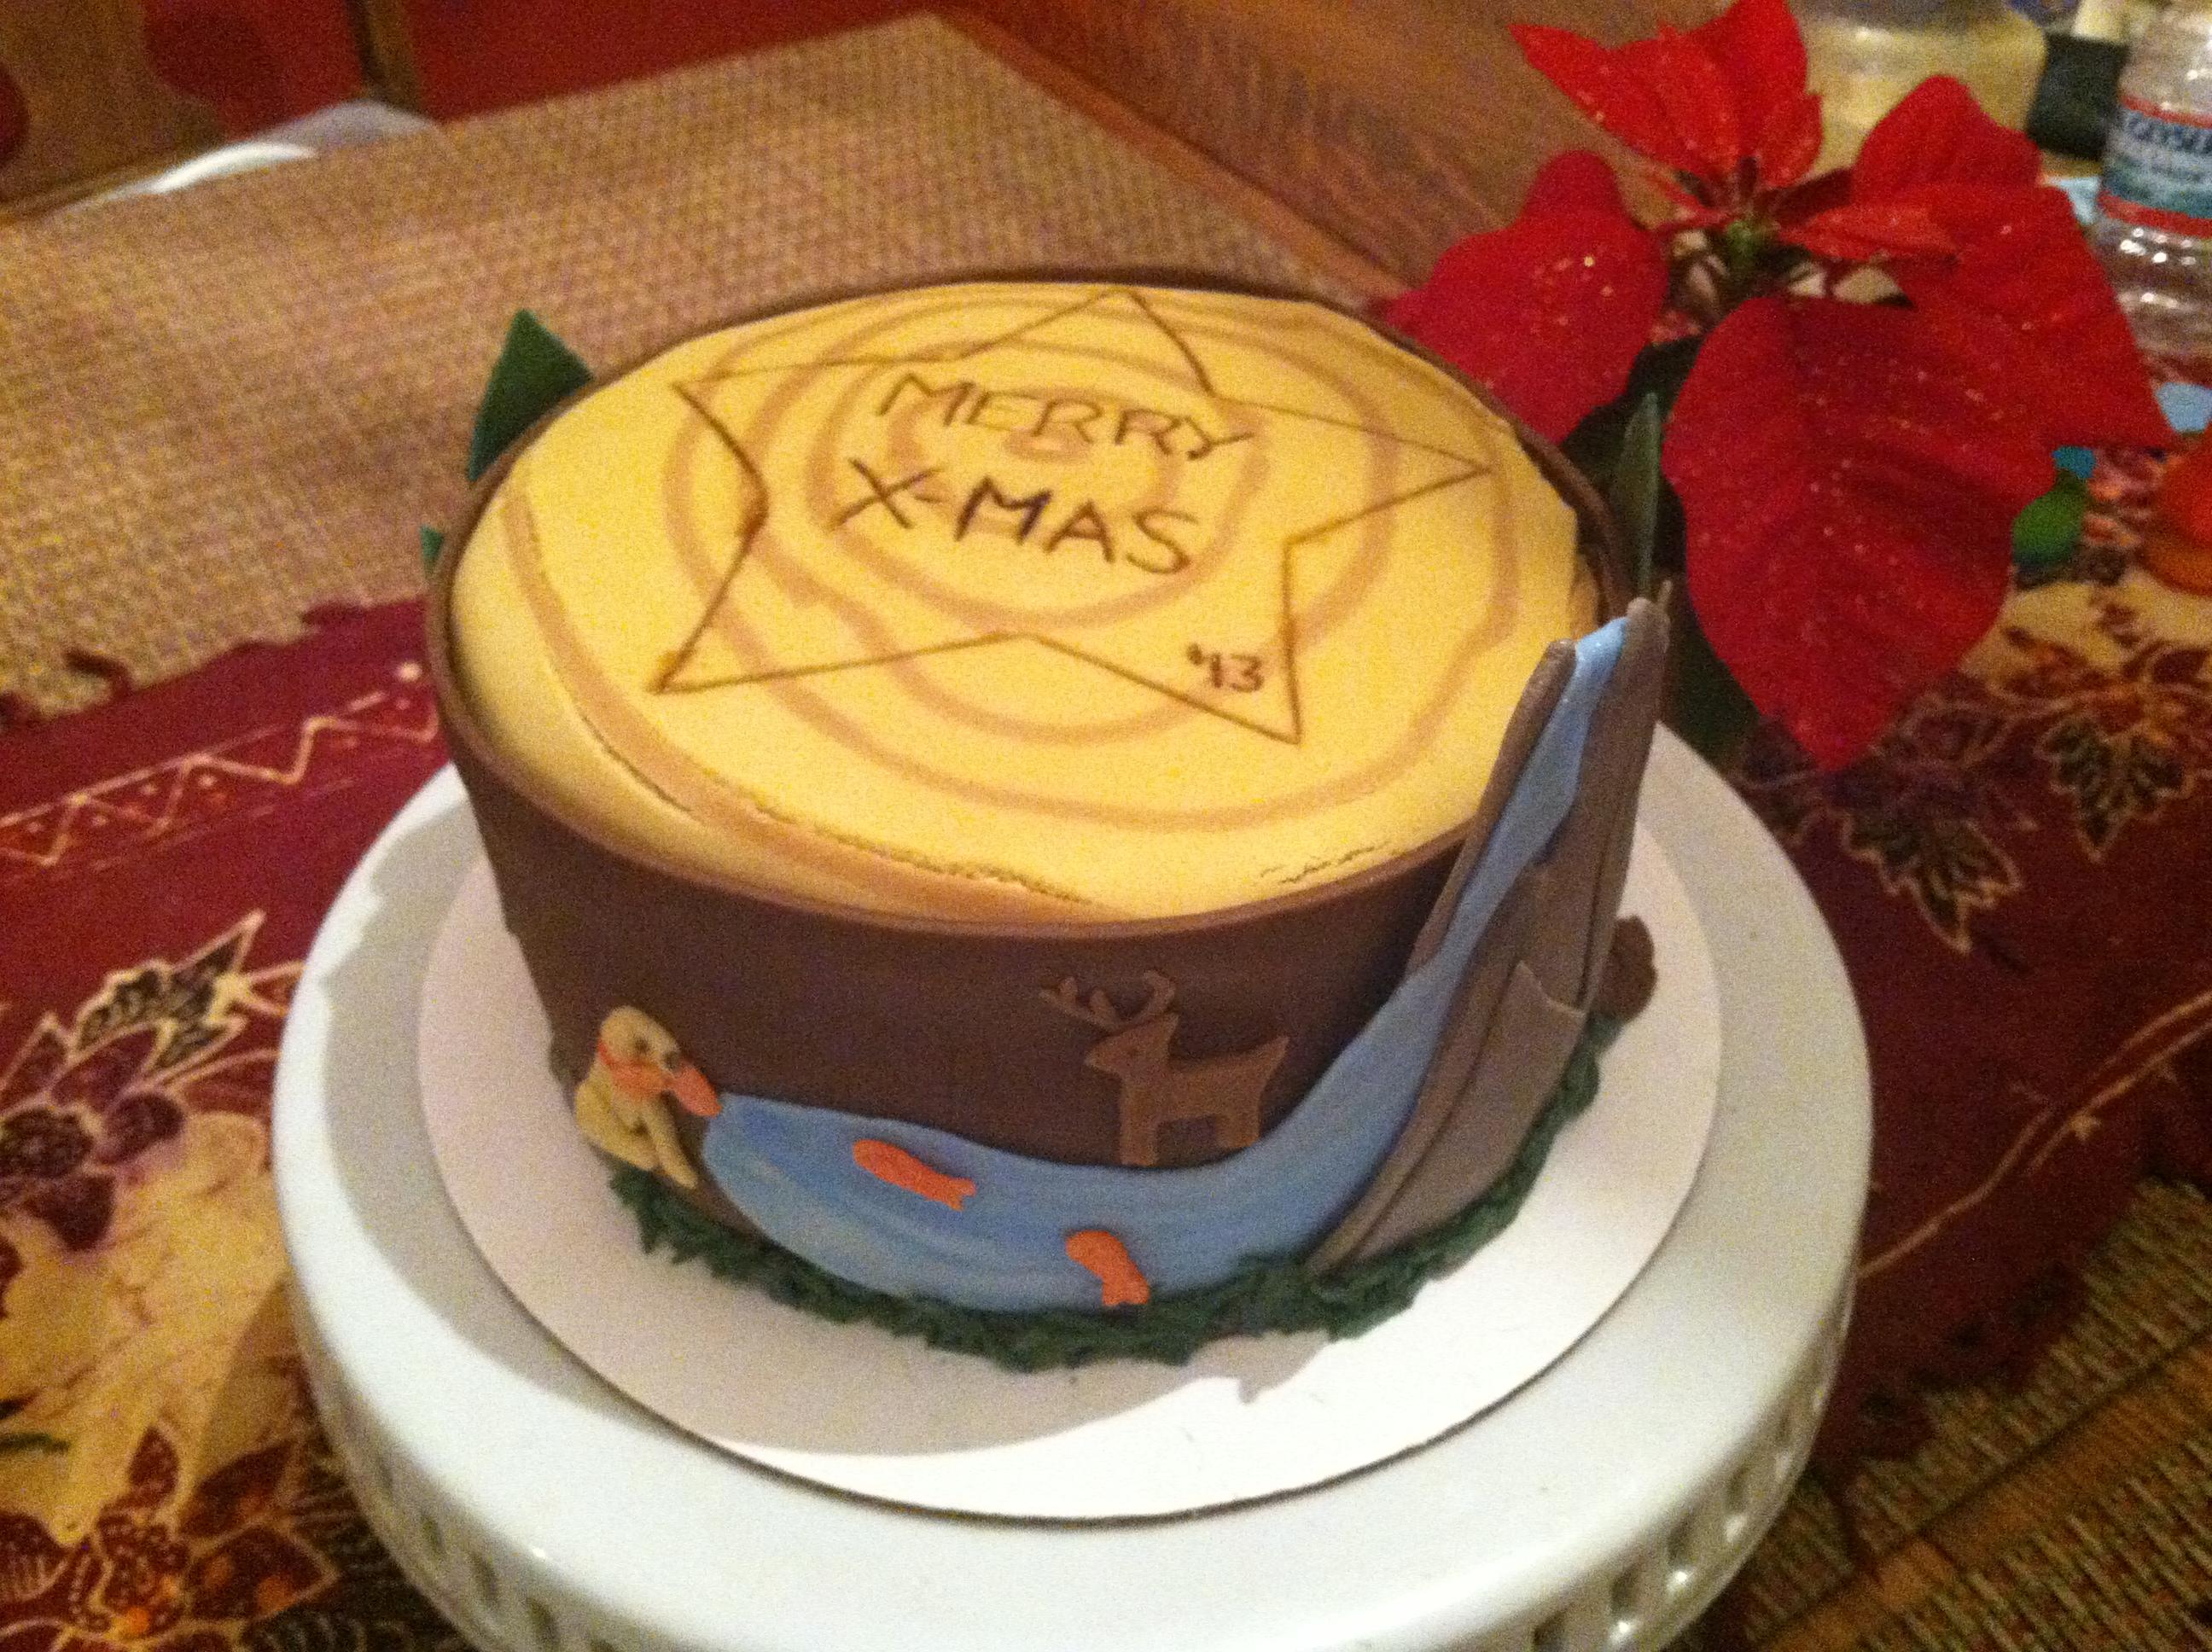 Adirondak Christmas Cake.png